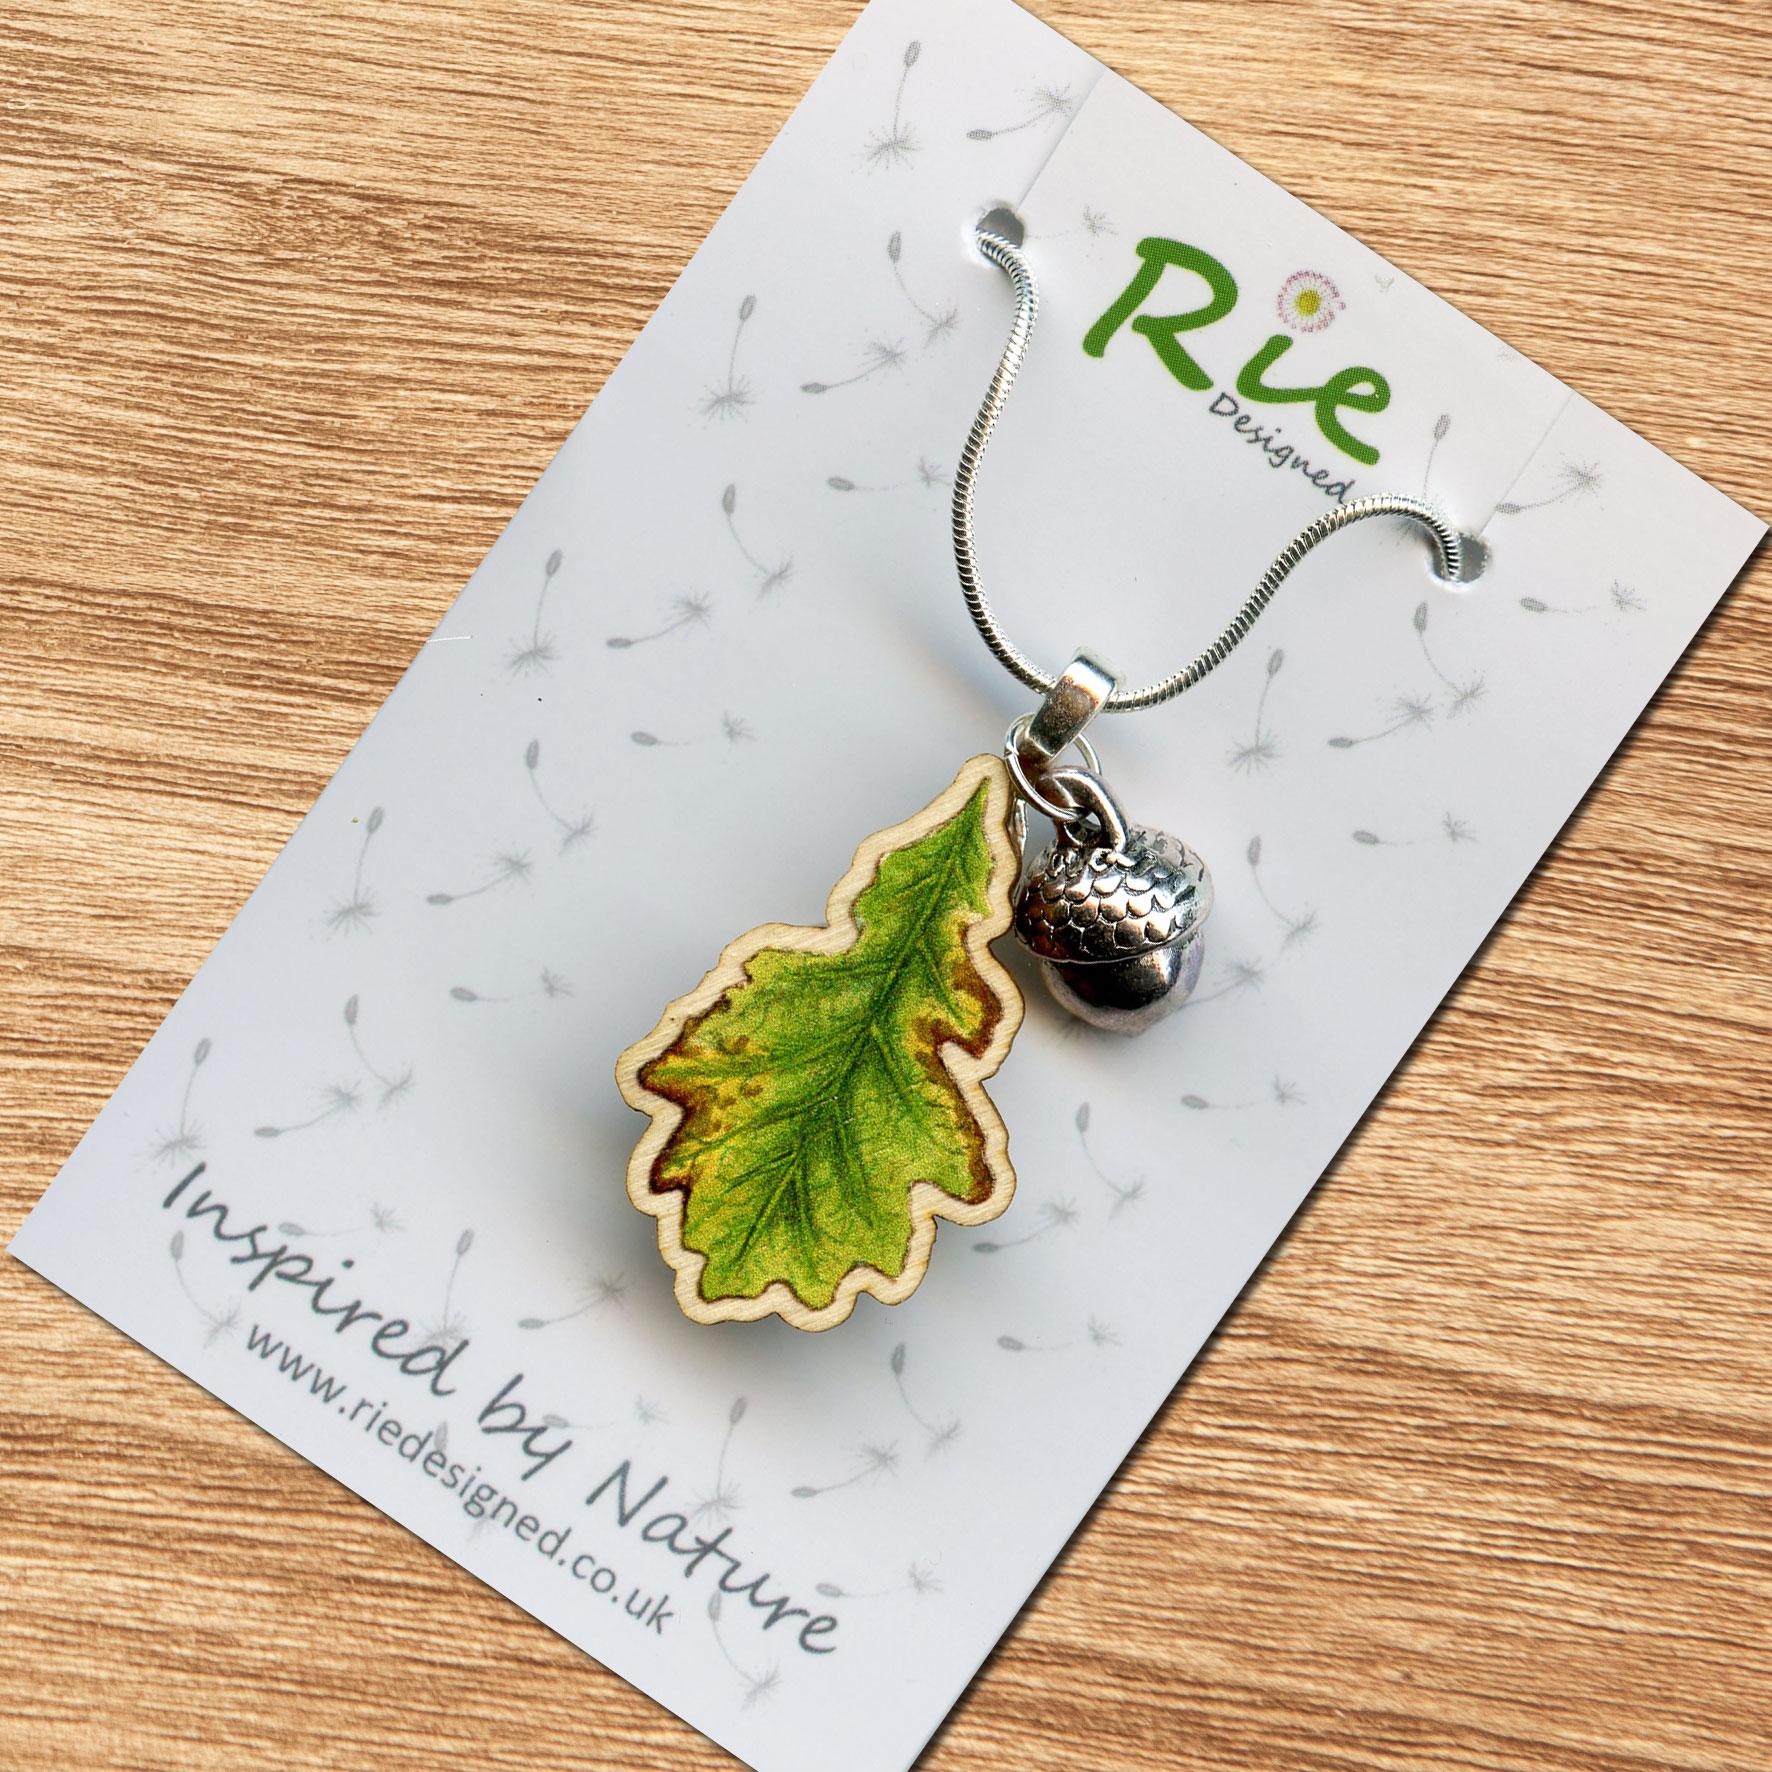 Wooden Oak Leaf & Acorn Charm Pendant Necklace Intended For Current Oak Leaf Necklaces (Gallery 12 of 25)